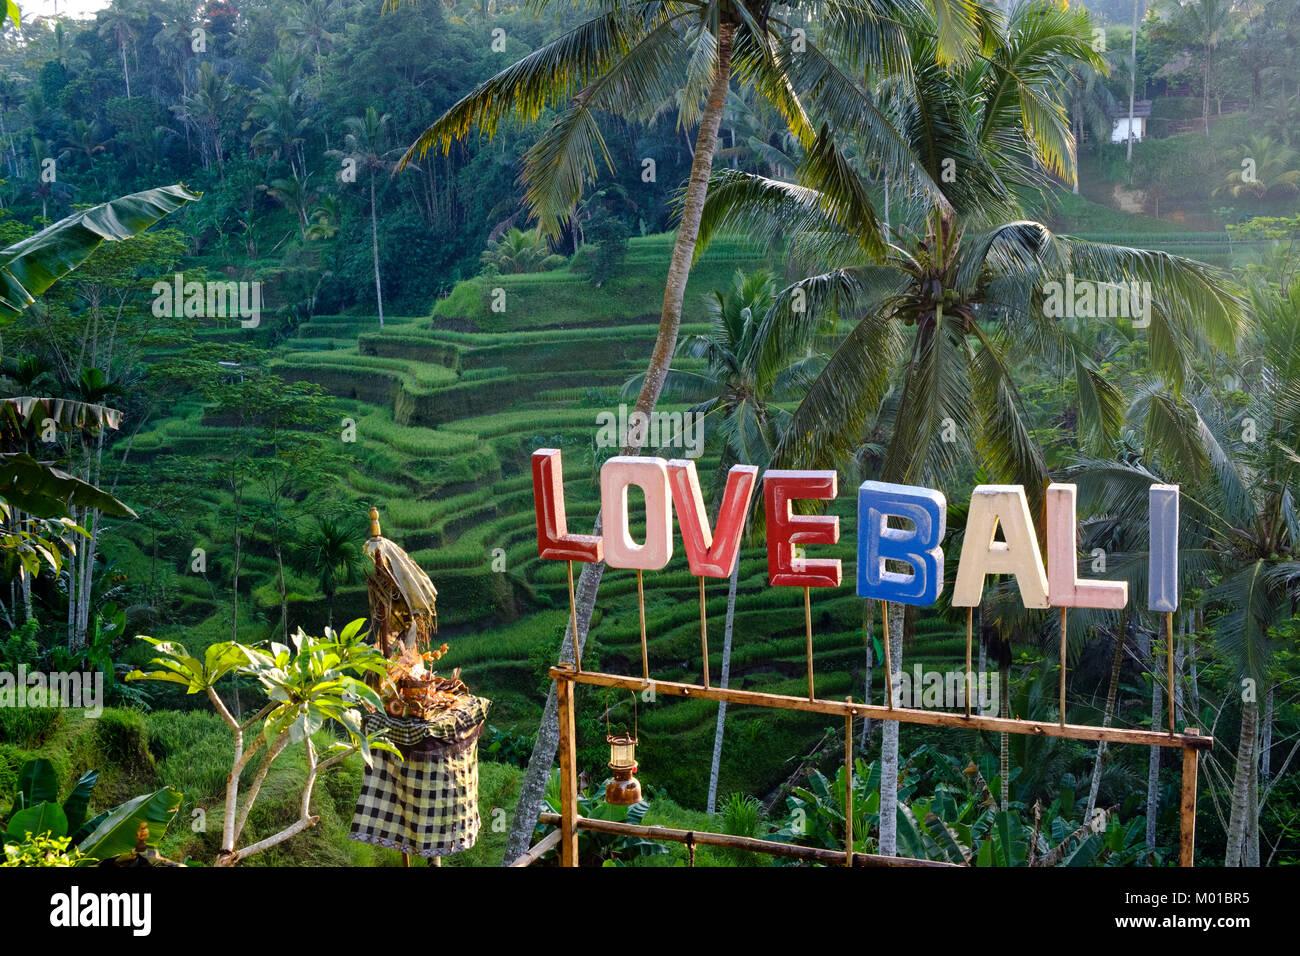 'Love Bali' sign at the Tegallalang rice terraces near Ubud, Bali, Indonesia. - Stock Image